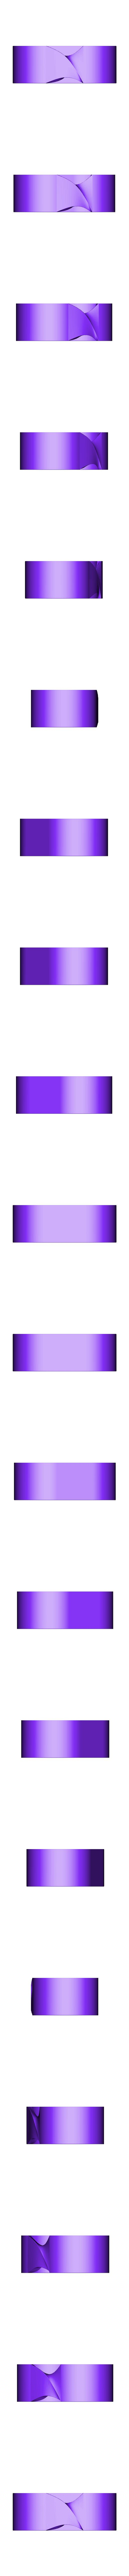 Descargar Archivo Stl Espada Uzui Tengen Demon Slayer Kimetsu No Espada Yaiba Modelo Stl 3d Separado Para Impresion Diseno Para La Impresora 3d Cults Myanimelist is the largest online anime and manga database in the world! espada uzui tengen demon slayer kimetsu no espada yaiba modelo stl 3d separado para impresion